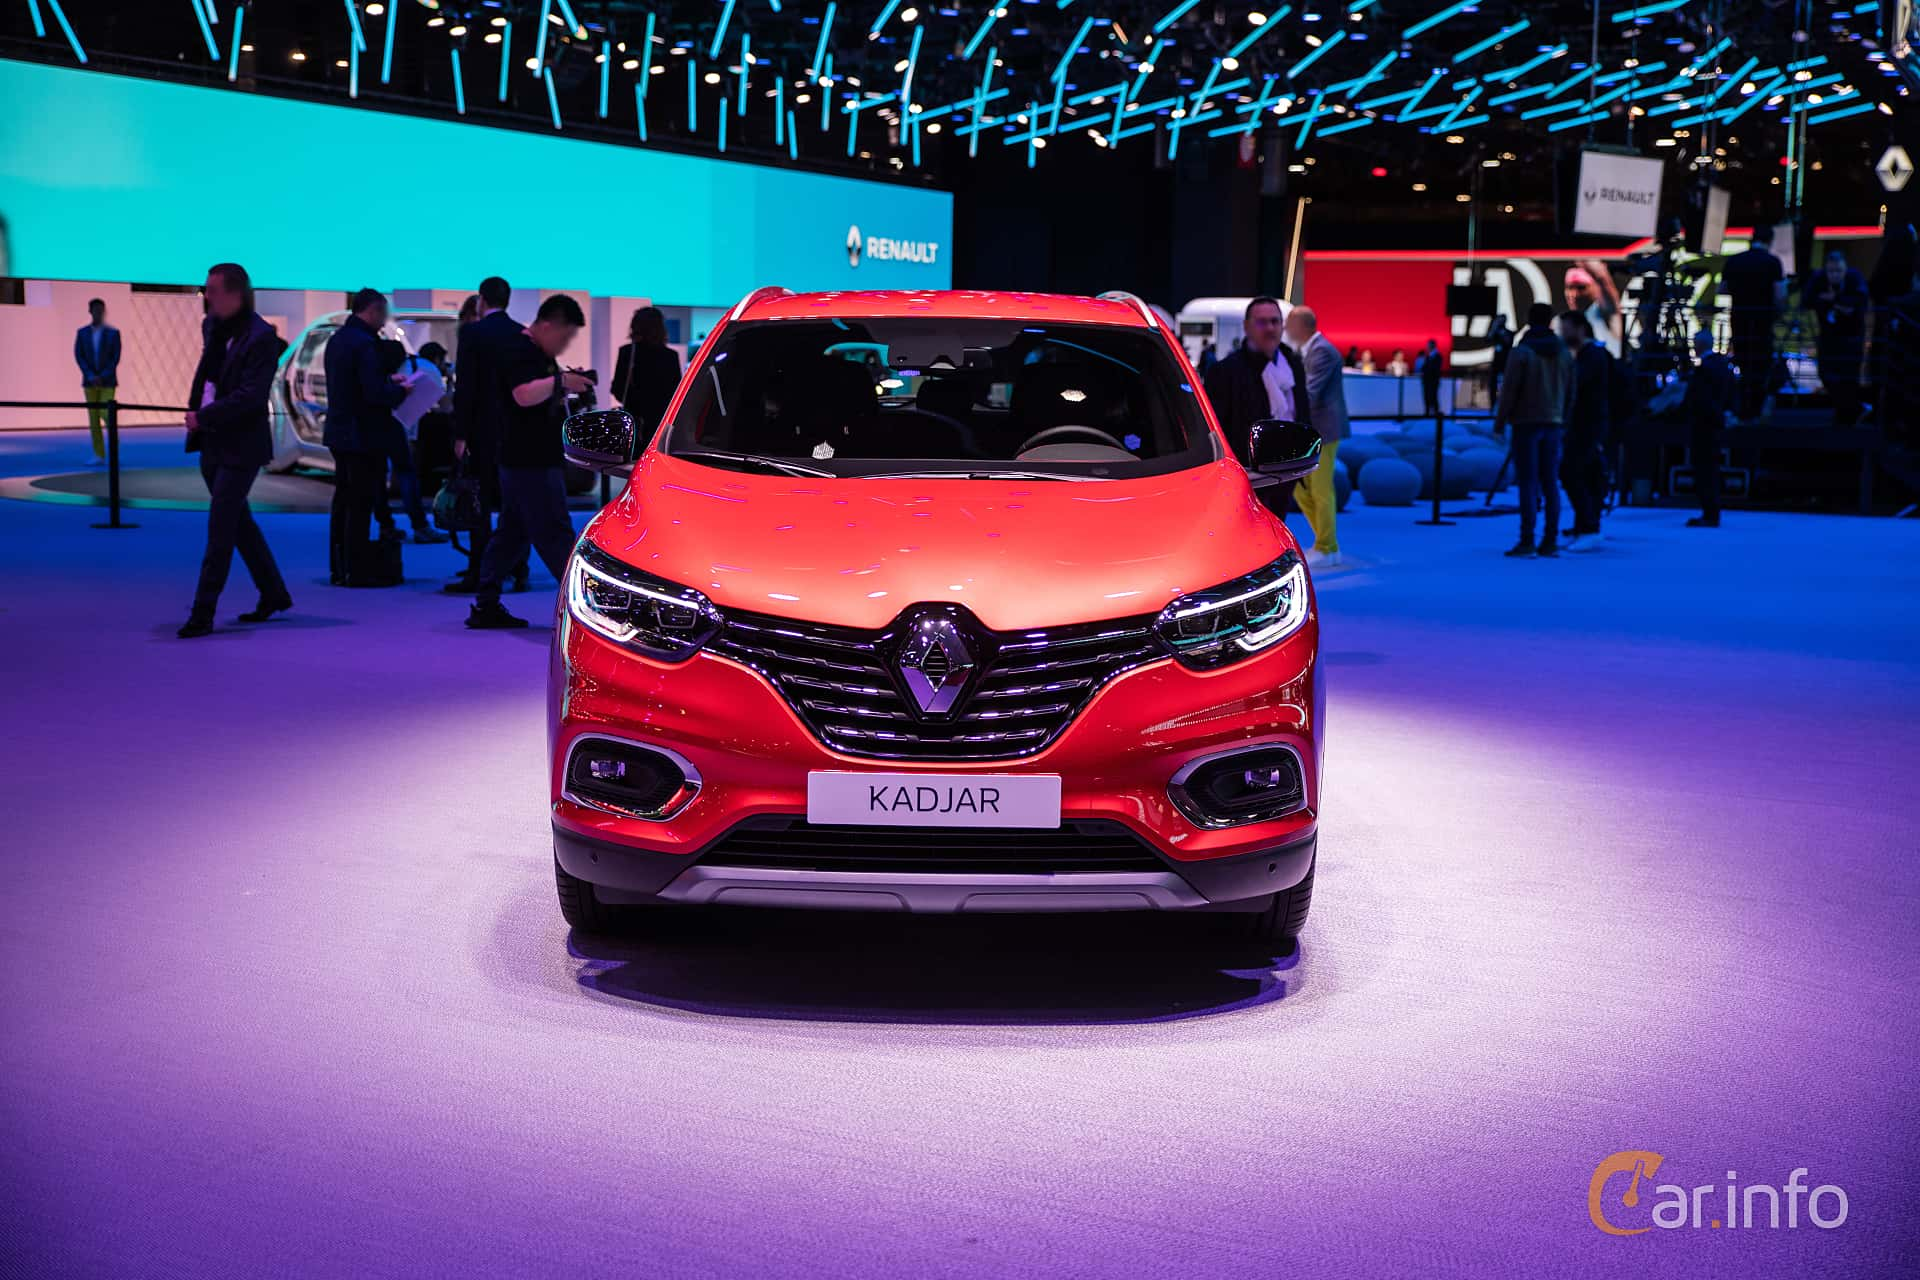 Renault Kadjar 1.5 Blue dCi EDC, 115hp, 2019 at Paris Motor Show 2018